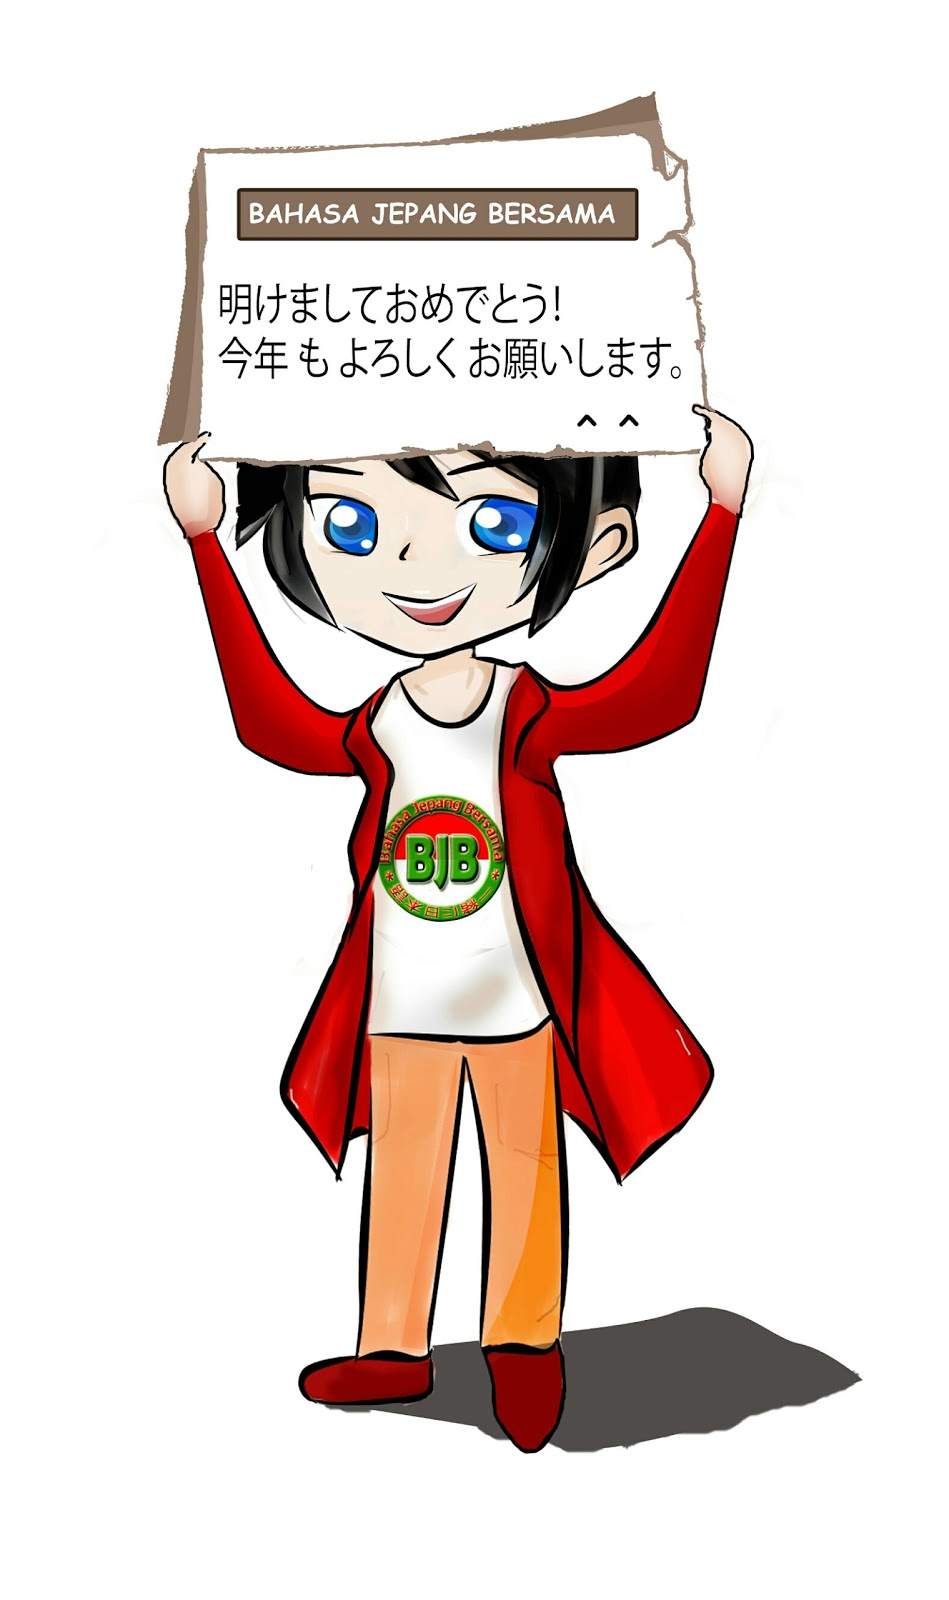 Istilah Istilah Bahasa Jepang Yang Terdapat Di Tahun Baru Belajar